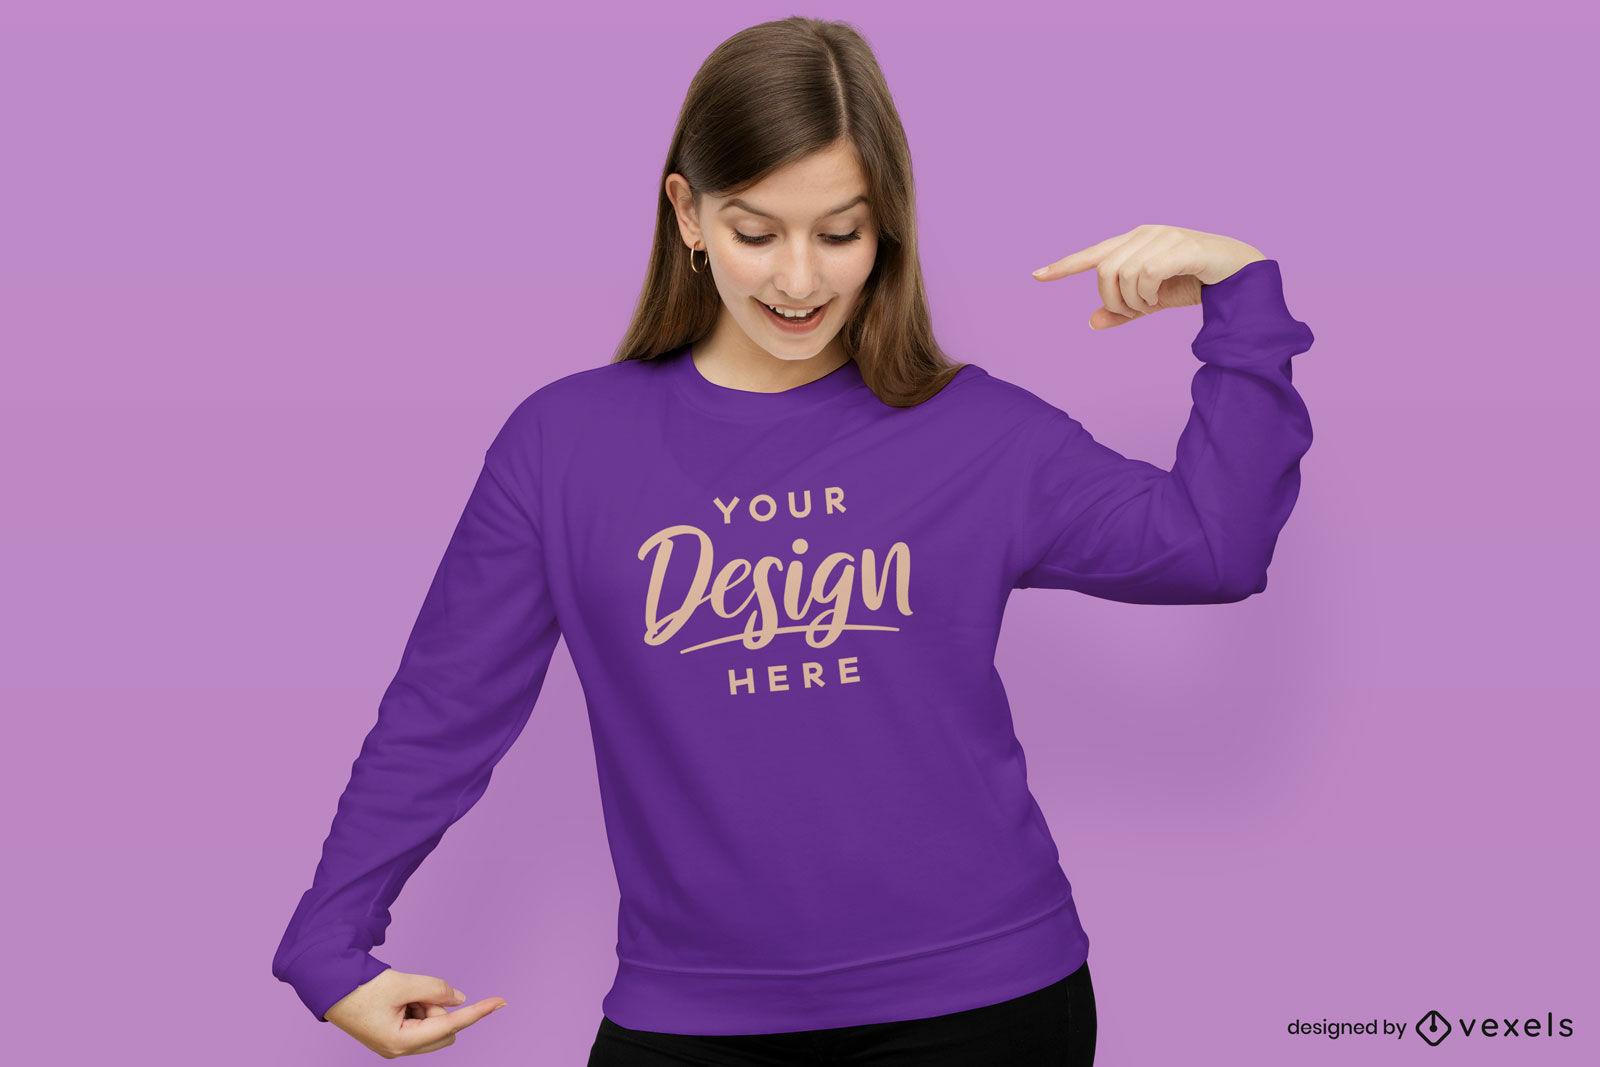 Girl in sweatshirt purple background mockup